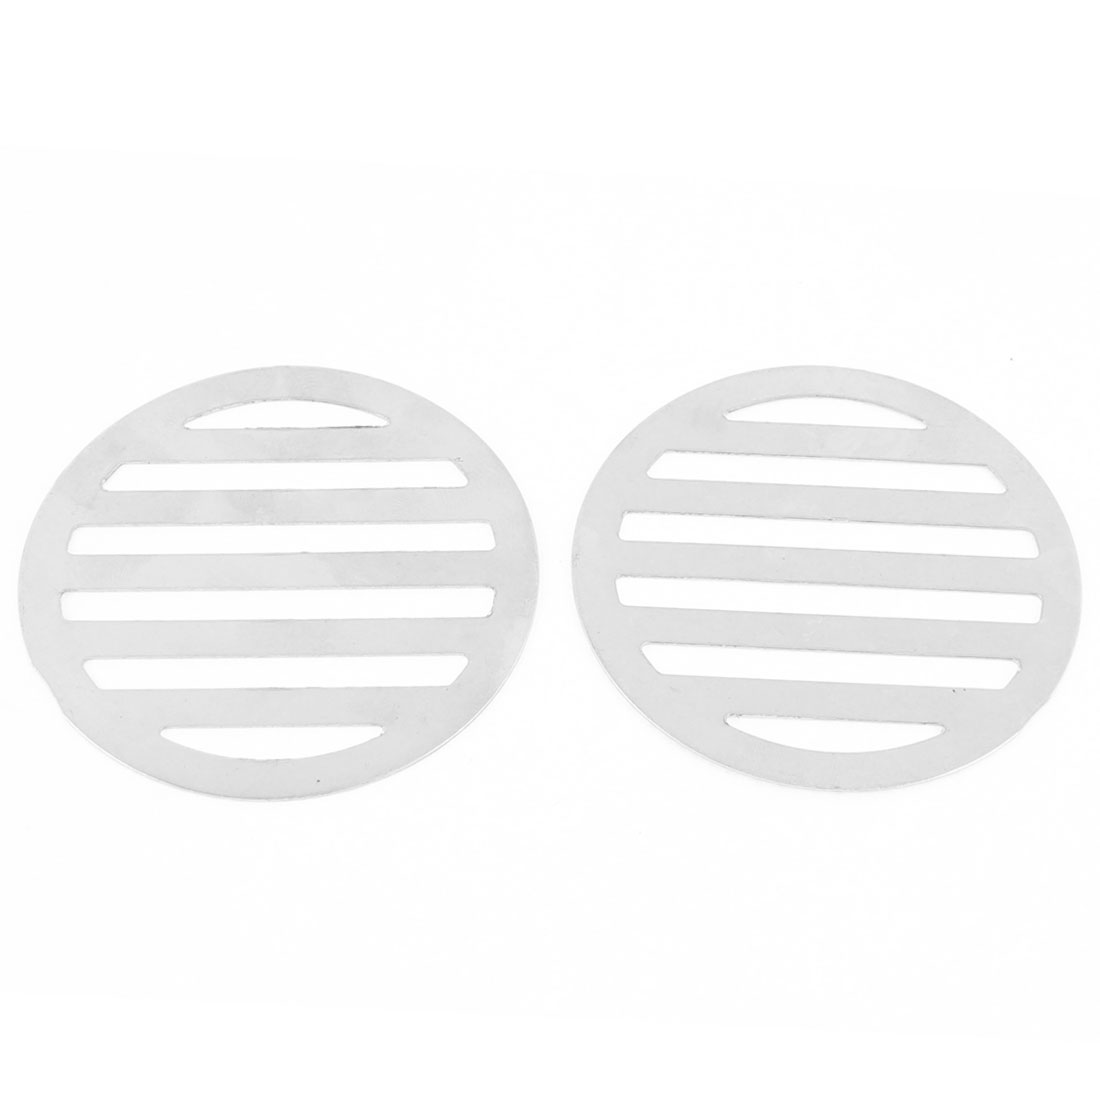 "Stainless Steel Kitchen Bathroom Round Floor Drain Cover 3.4"" 8.6cm 2Pcs"